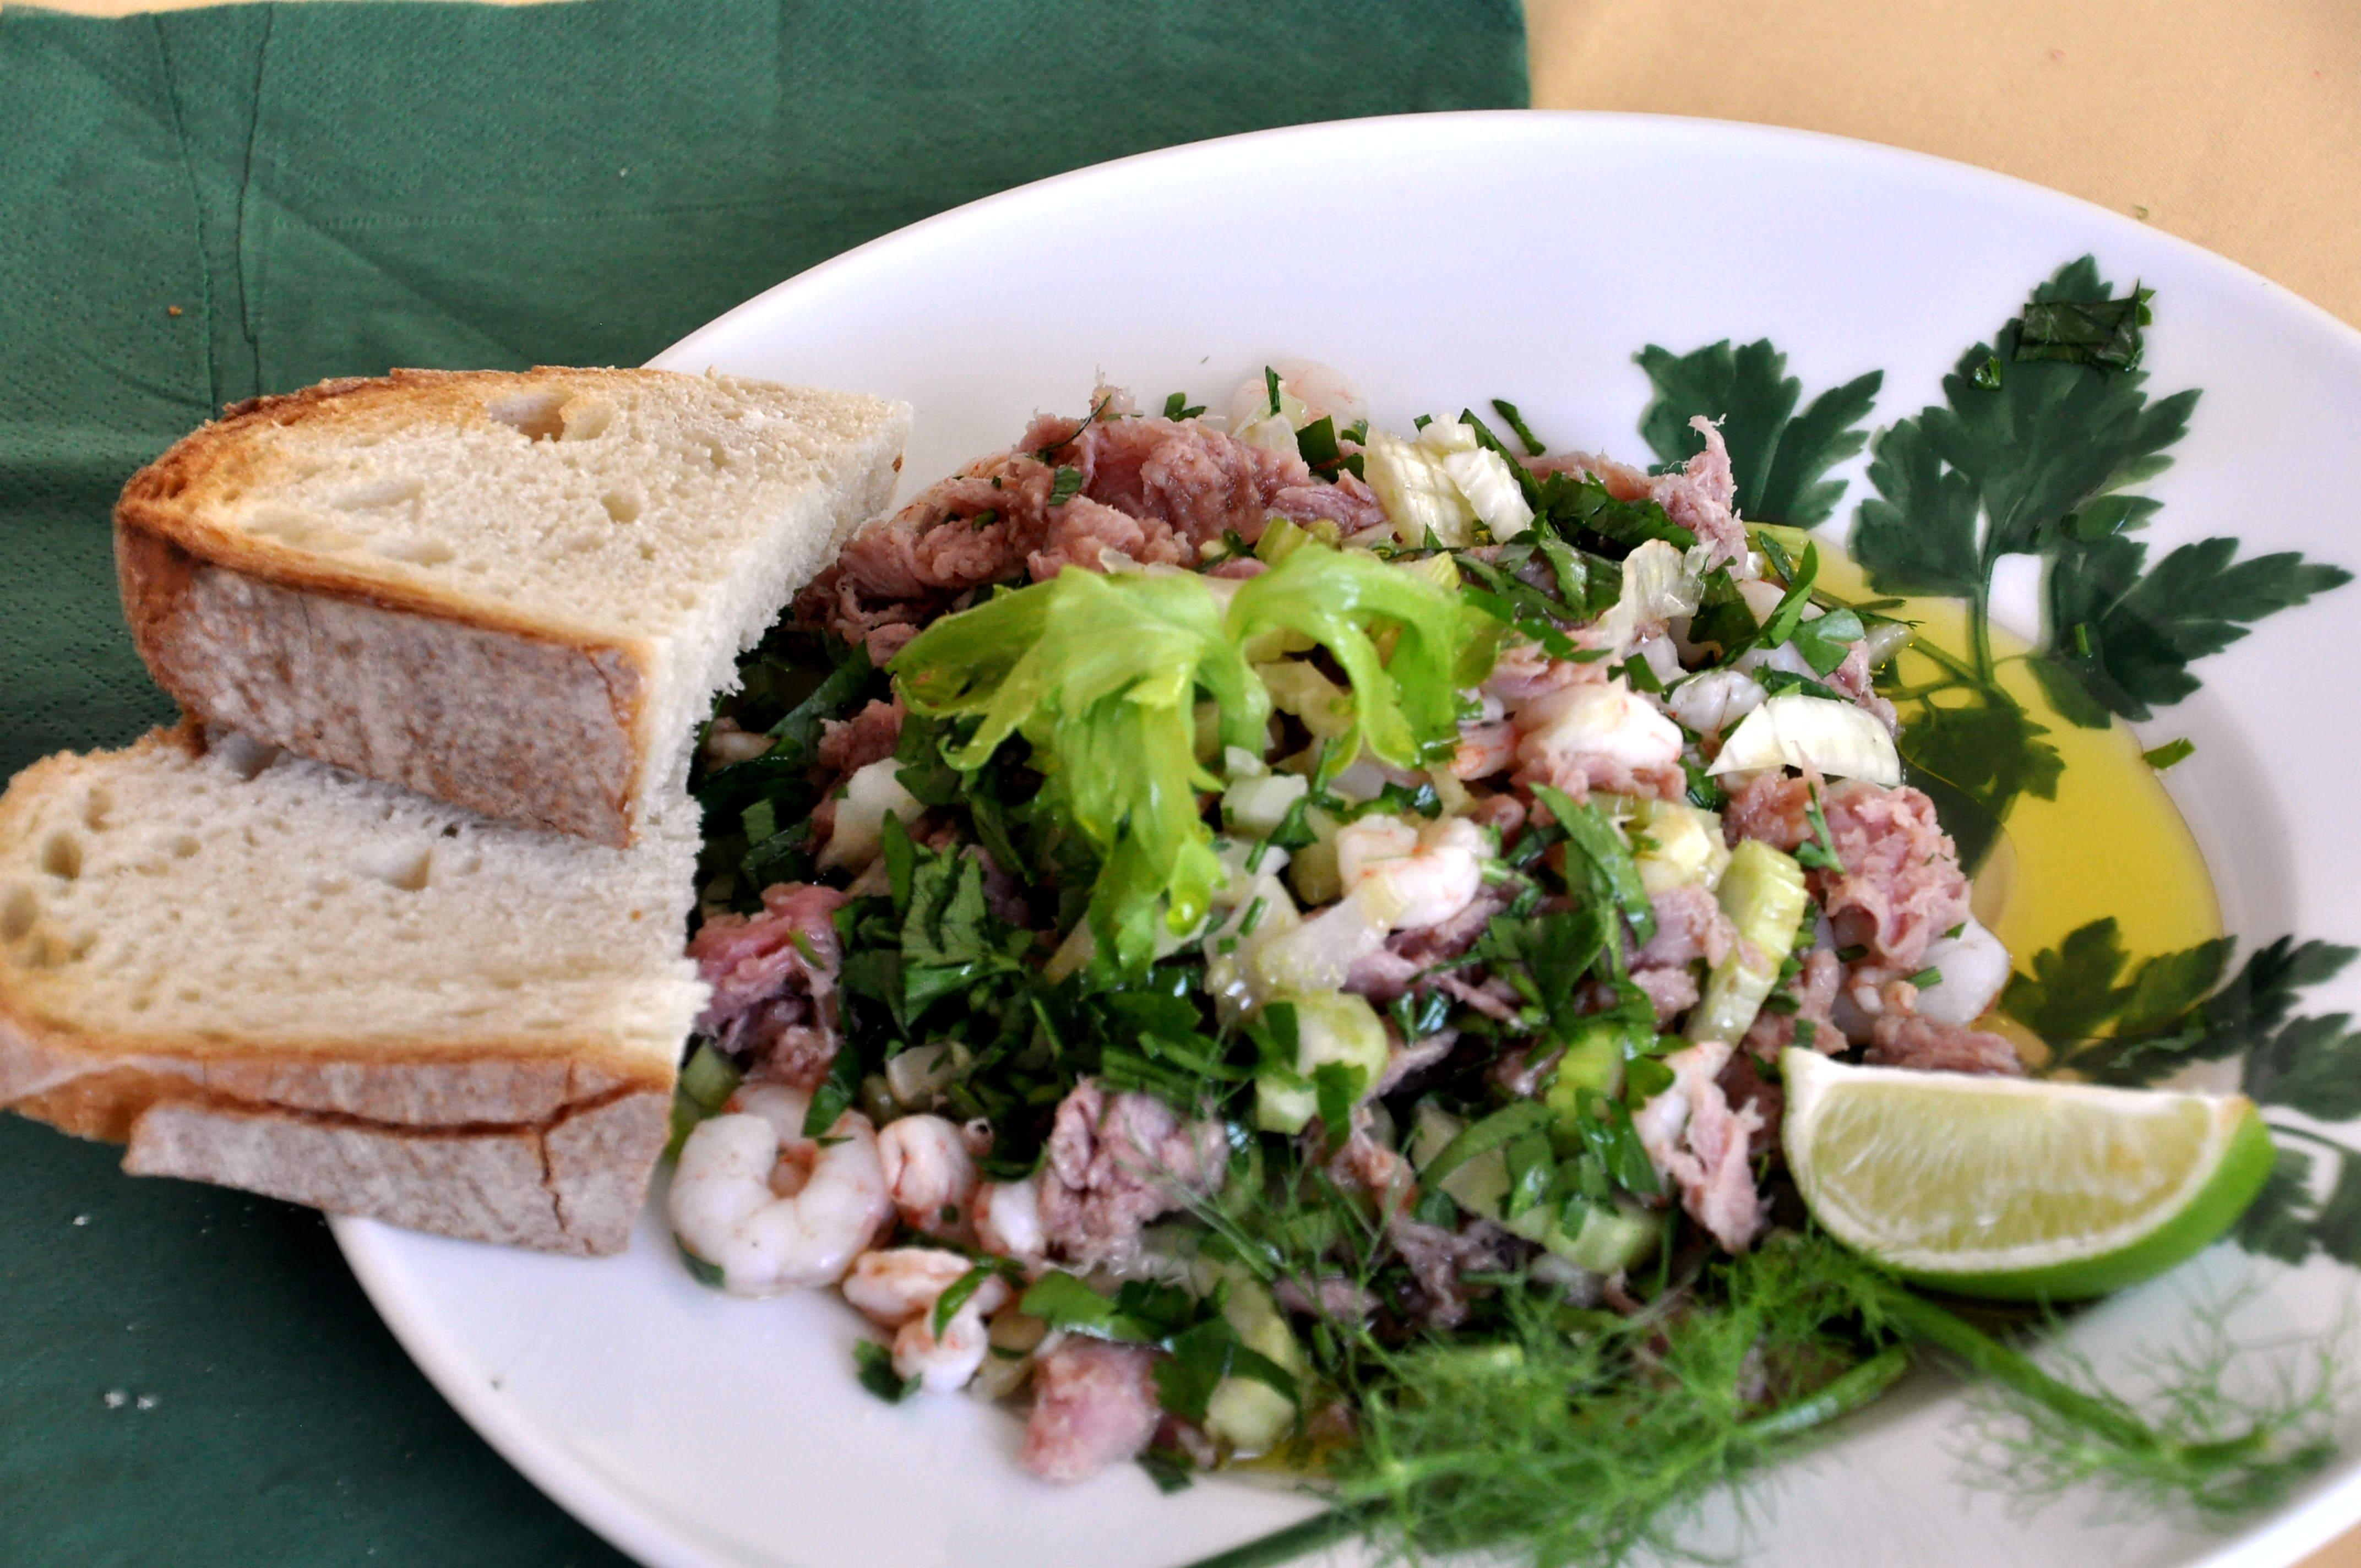 Estupeta Salat fertig auf dem Teller mit Brot